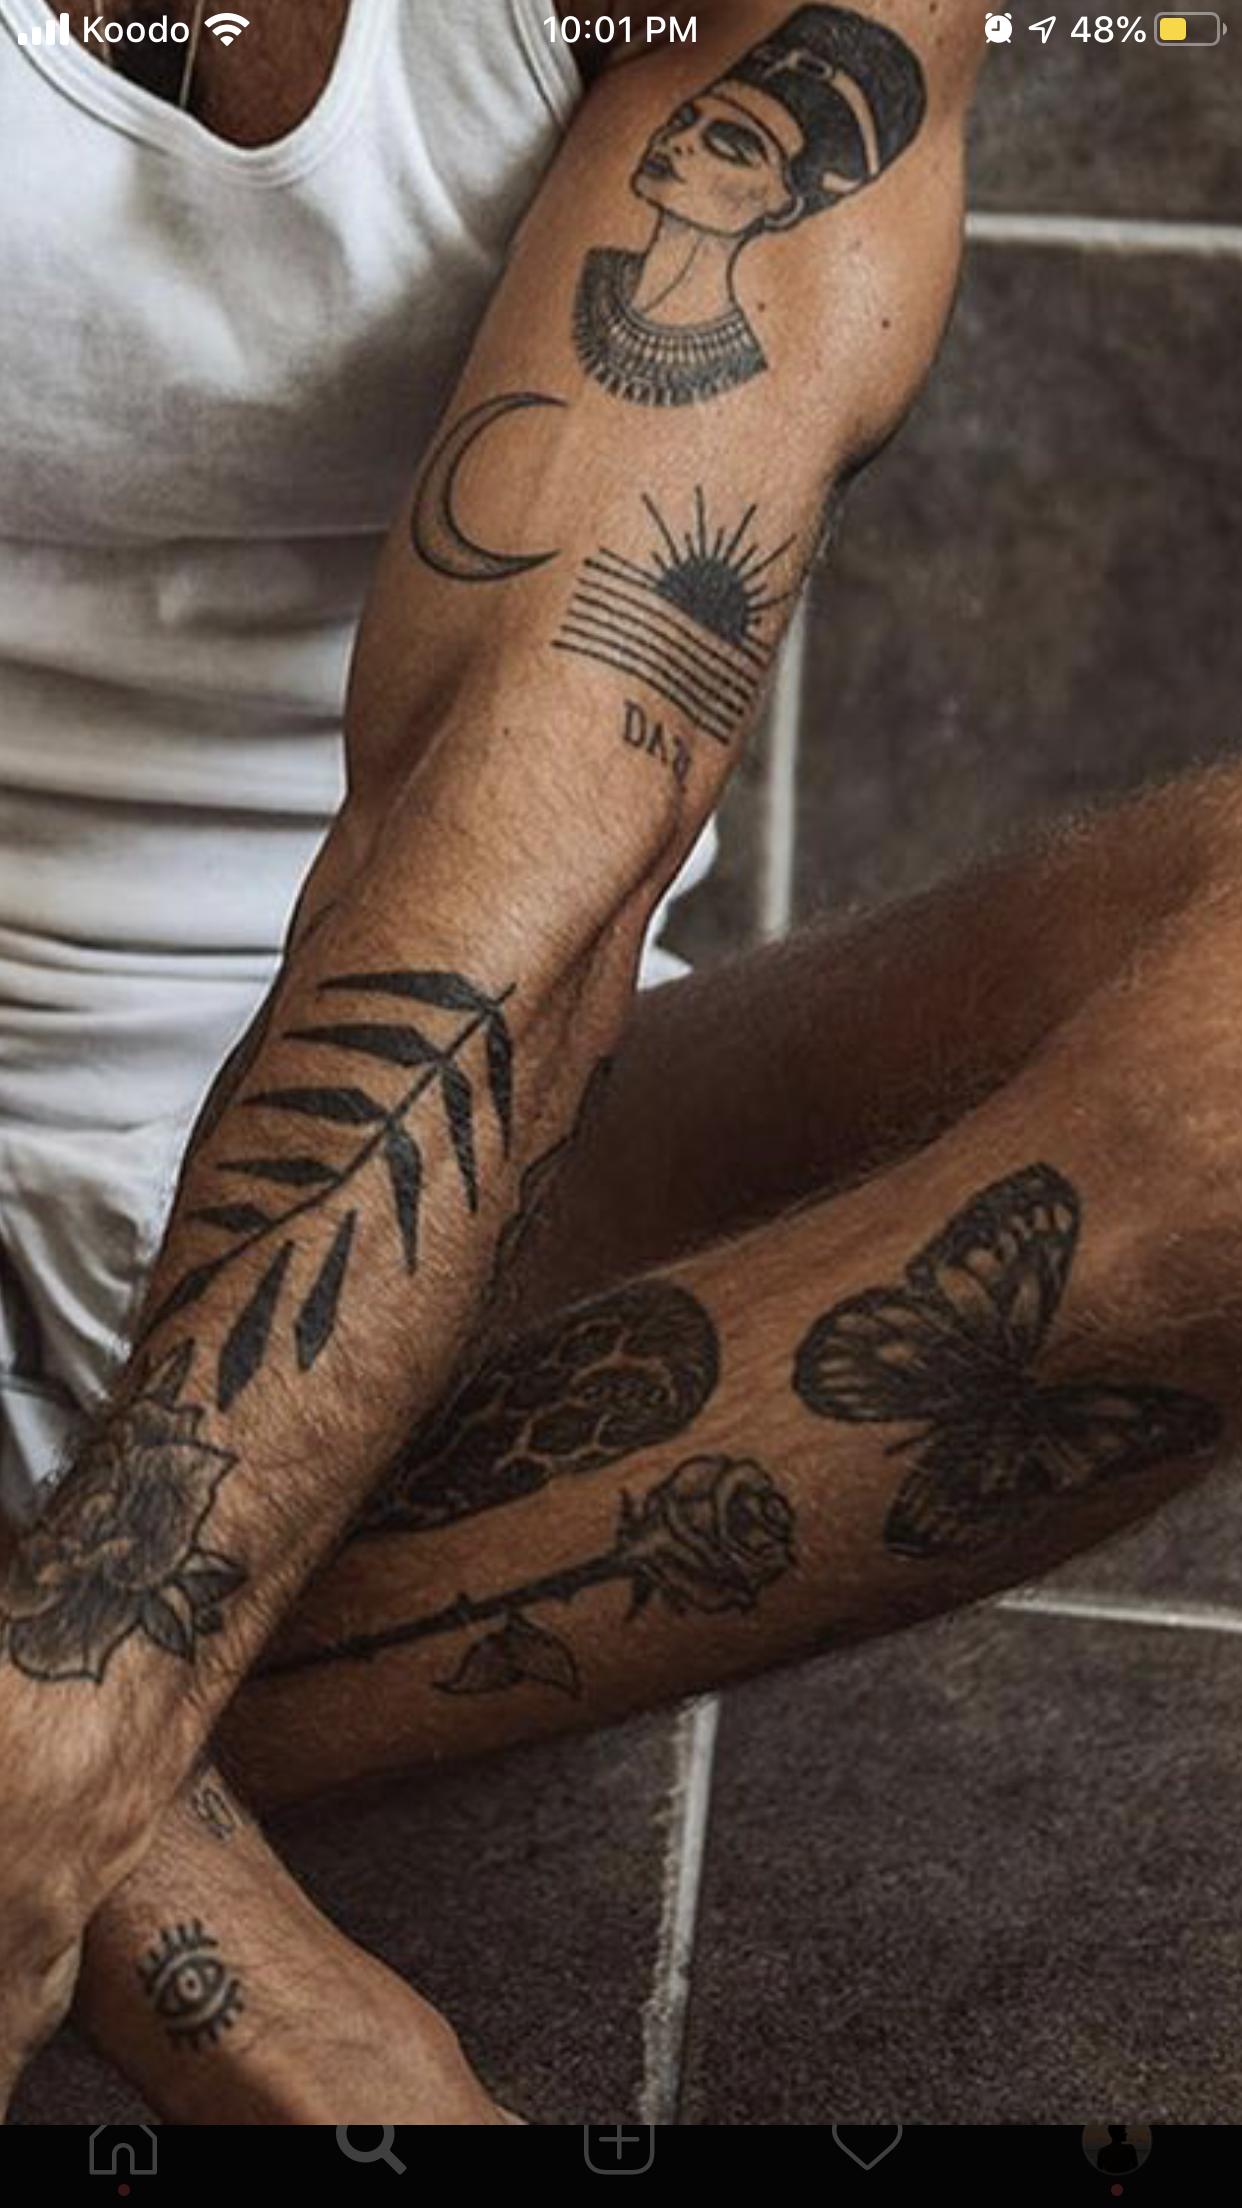 Untitled in 2020 Body tattoos, Small tattoos, Hand tattoos